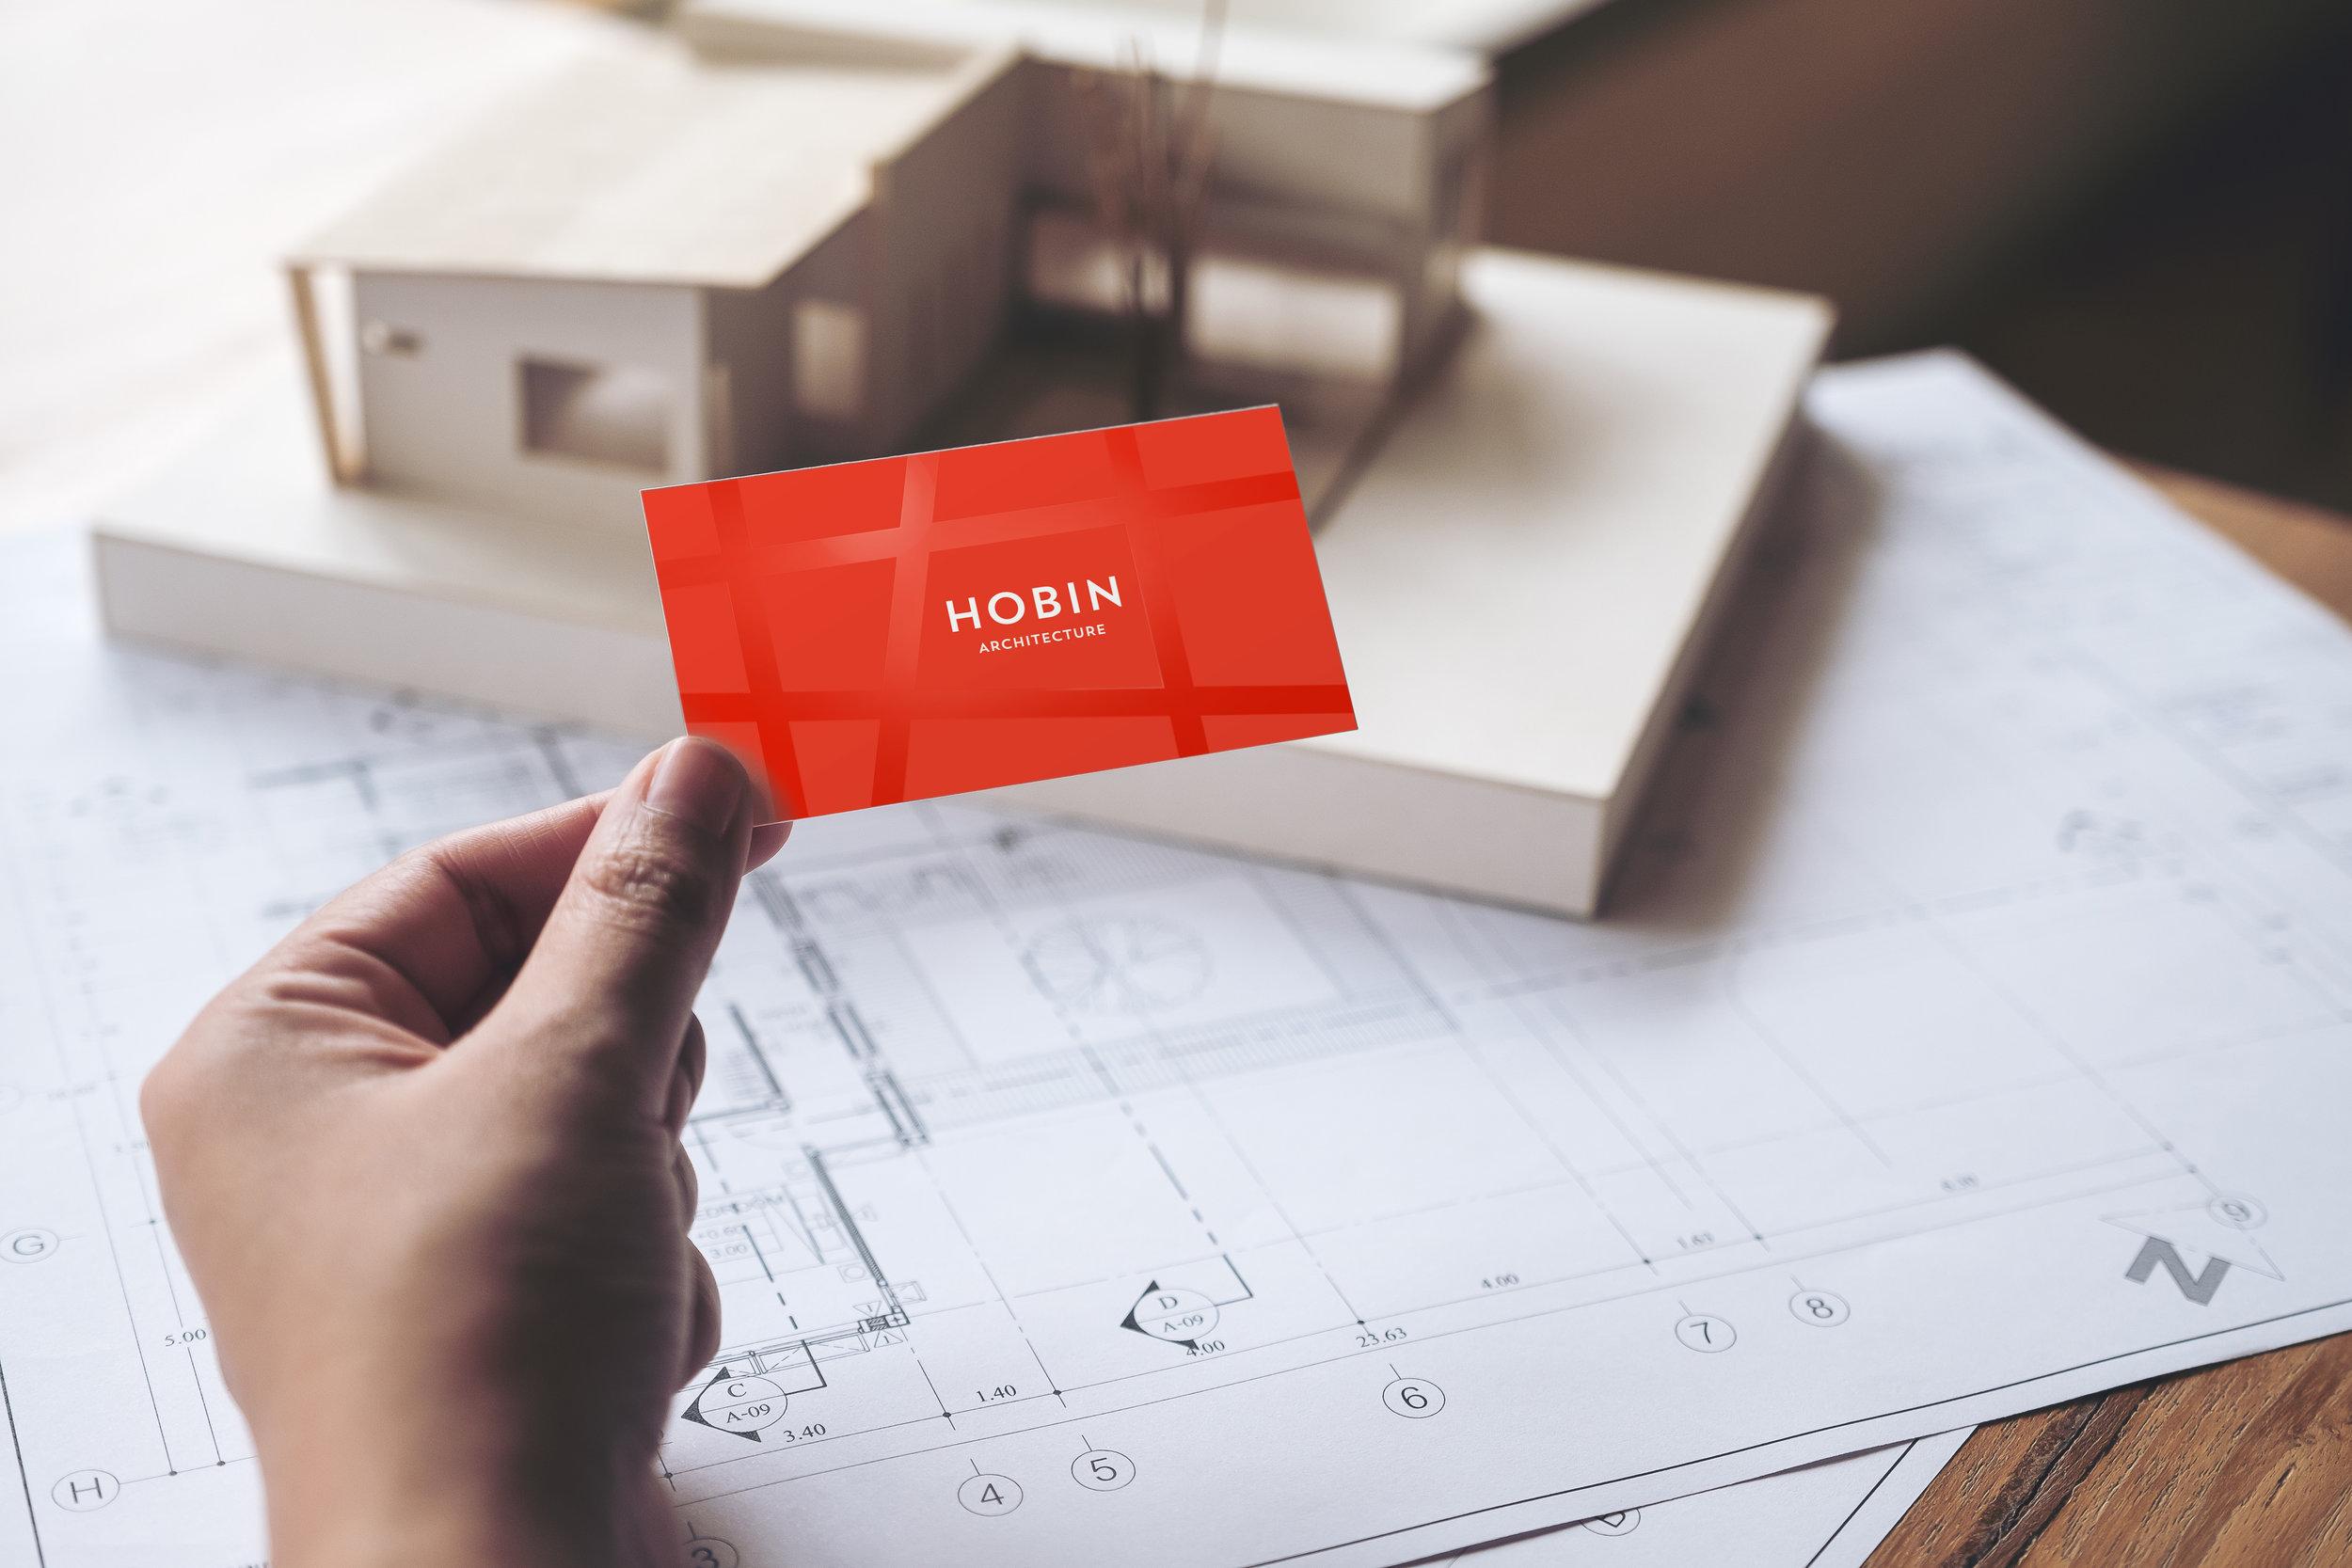 hobin_card.jpg